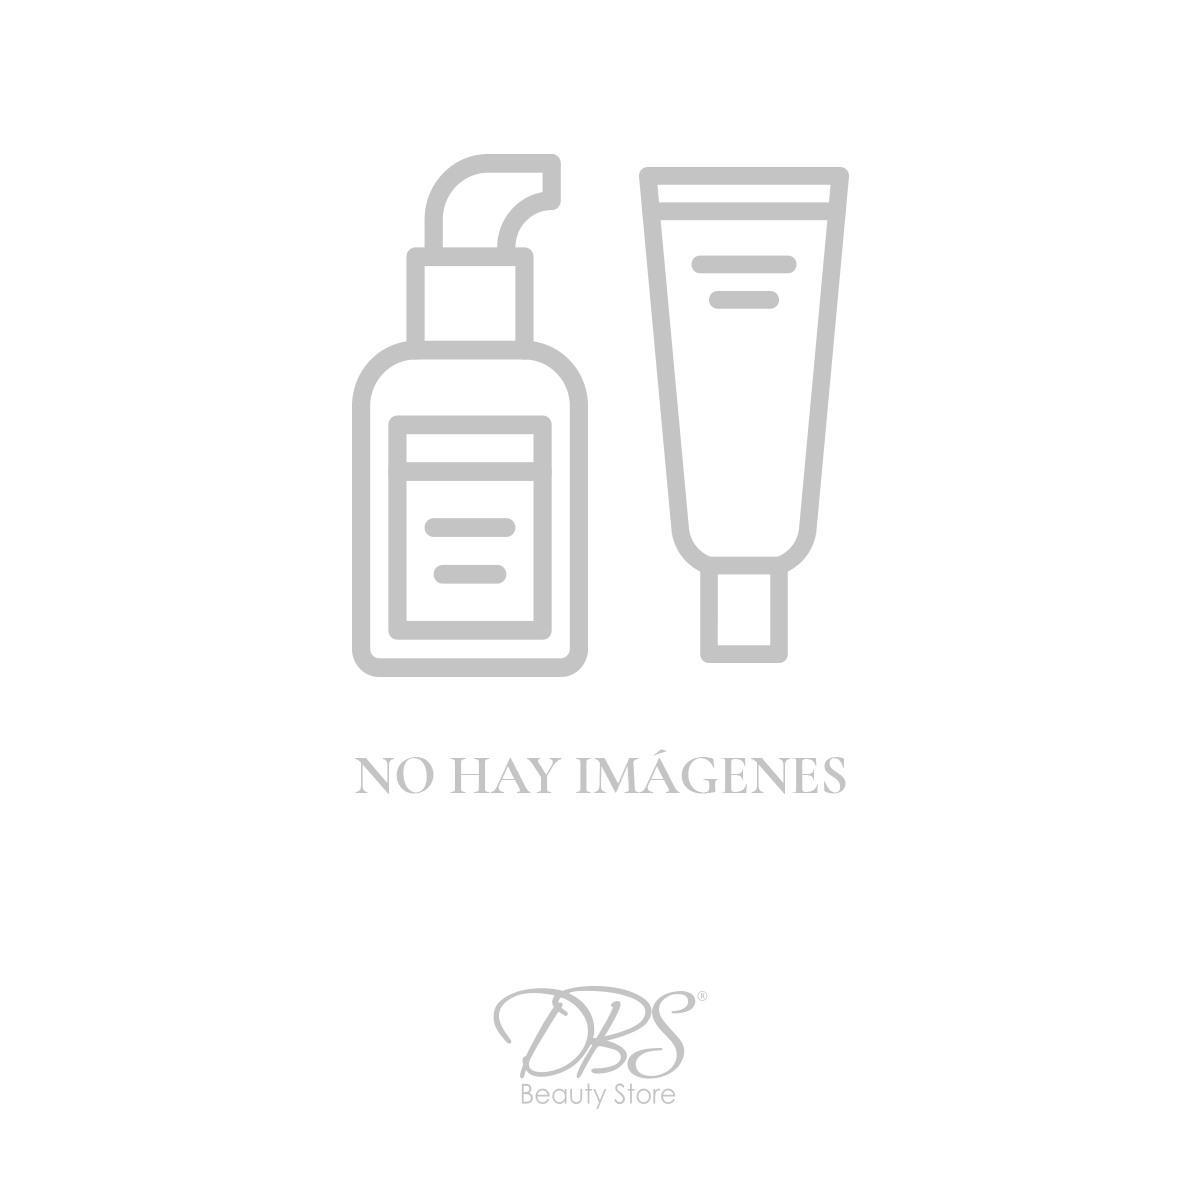 Pack Vitaminas Hair, Nails & Skin 2 Meses